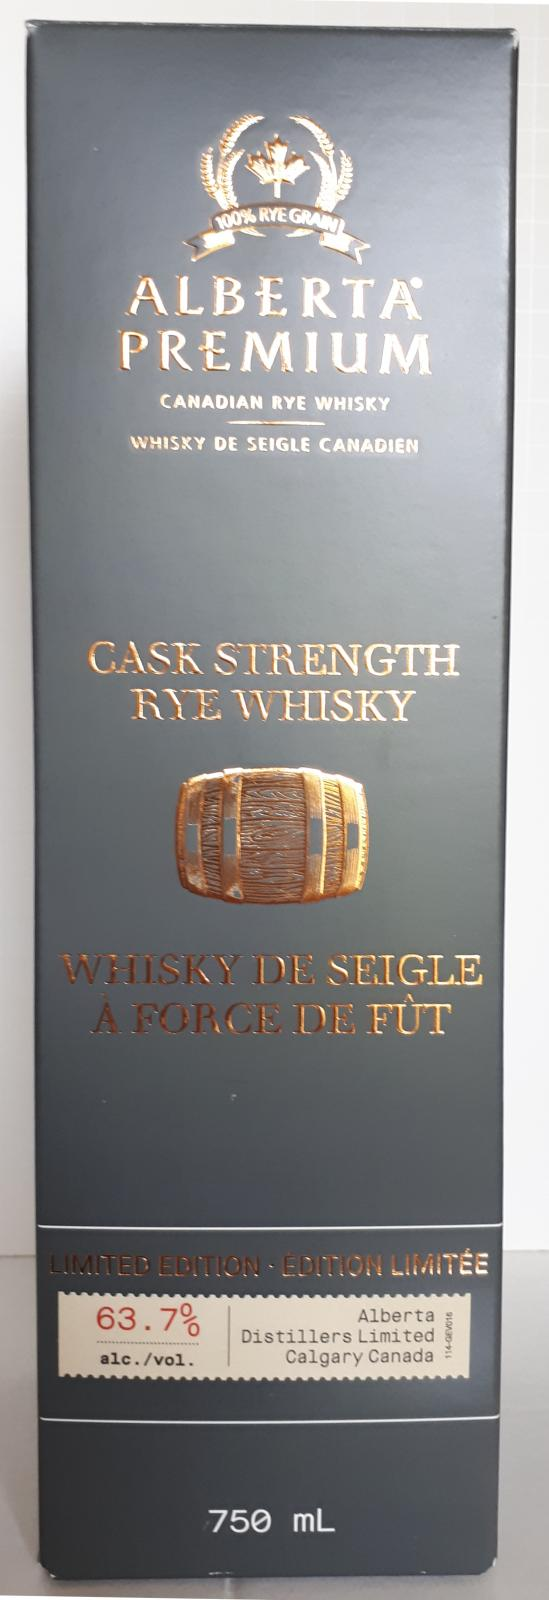 Alberta Premium Cask Strength Rye Whisky